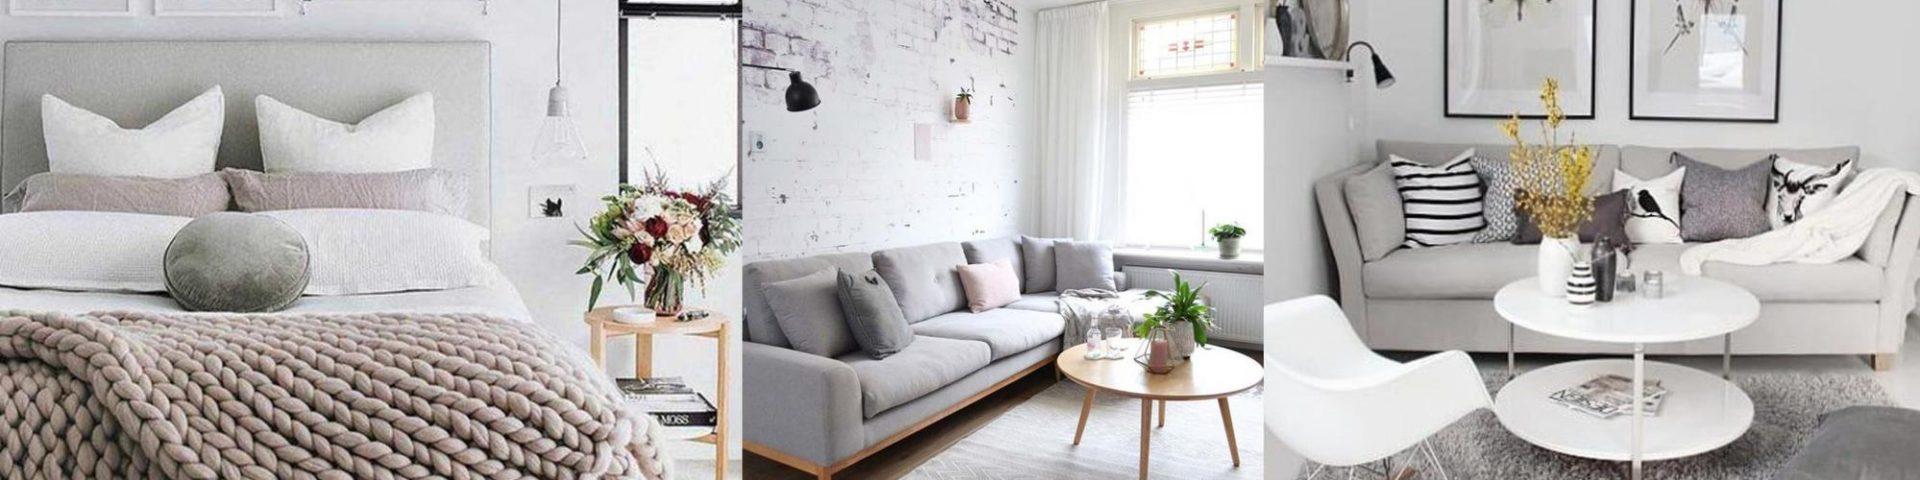 design escandinavo